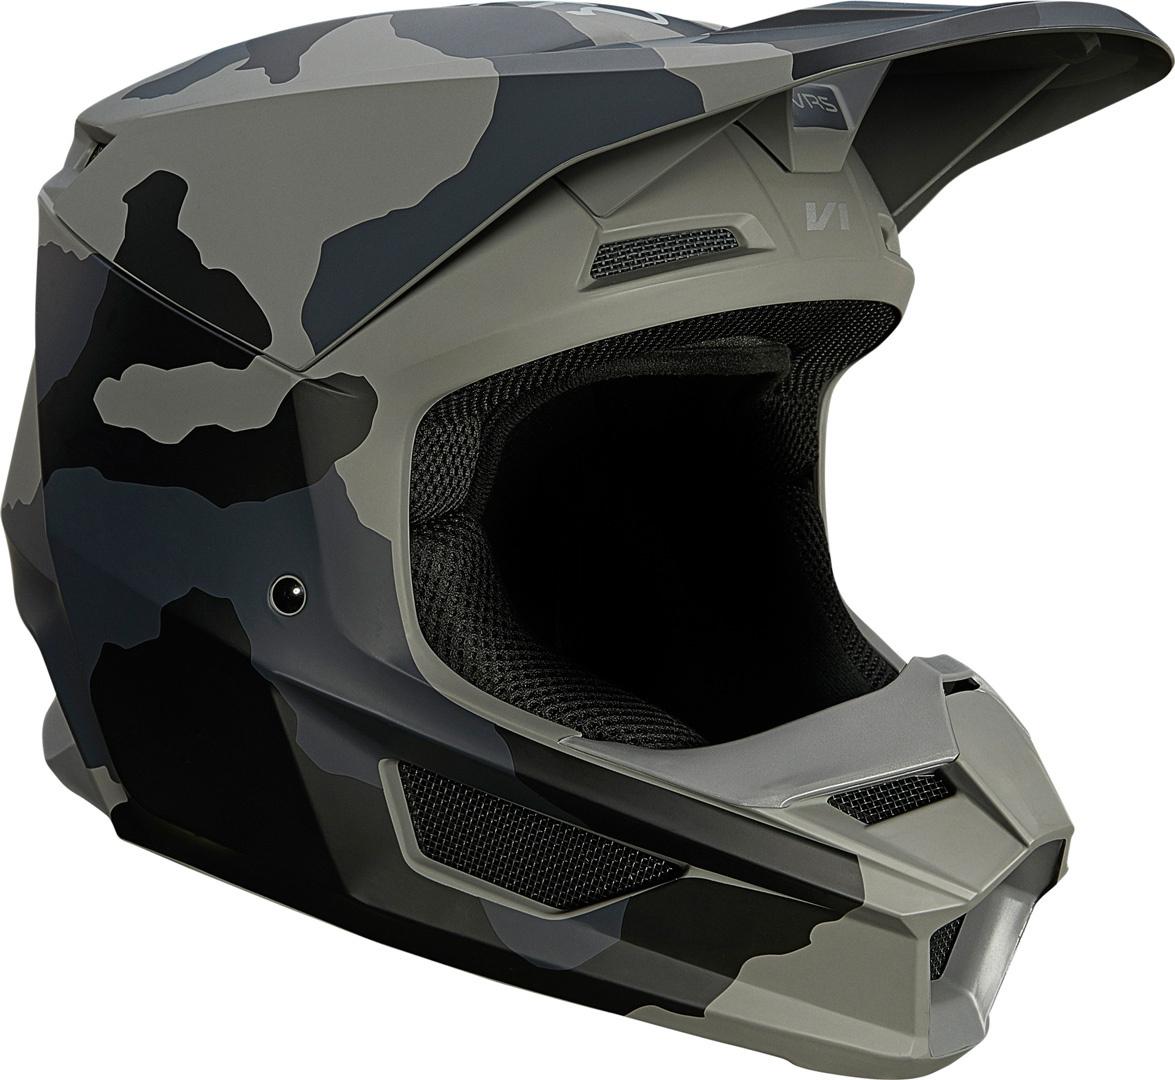 FOX V1 Trev Jugend Motocross Helm, schwarz, Größe M, schwarz, Größe M